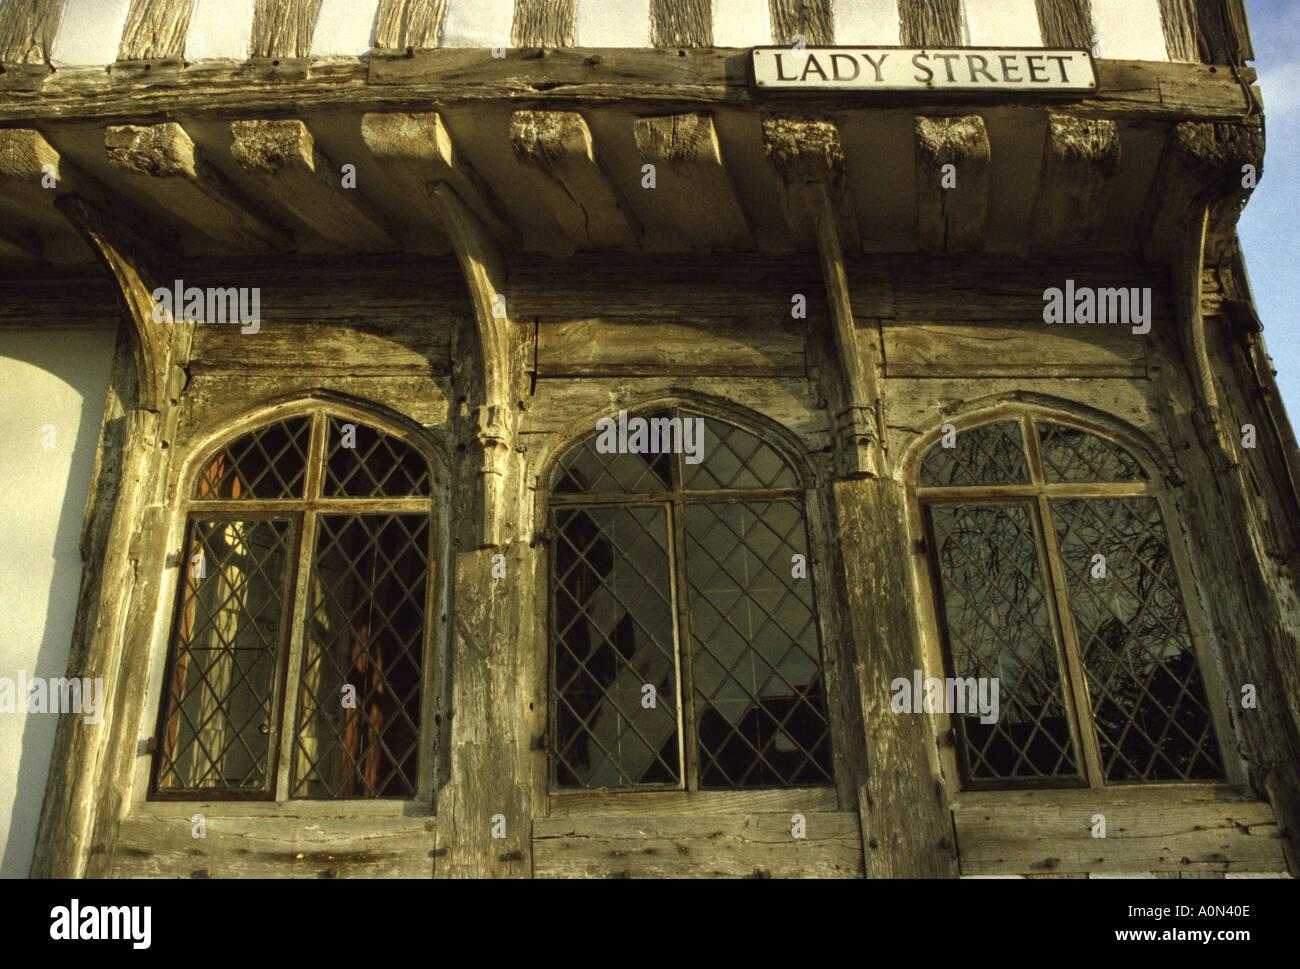 Lady Street Lavenham village Suffolk England - Stock Image